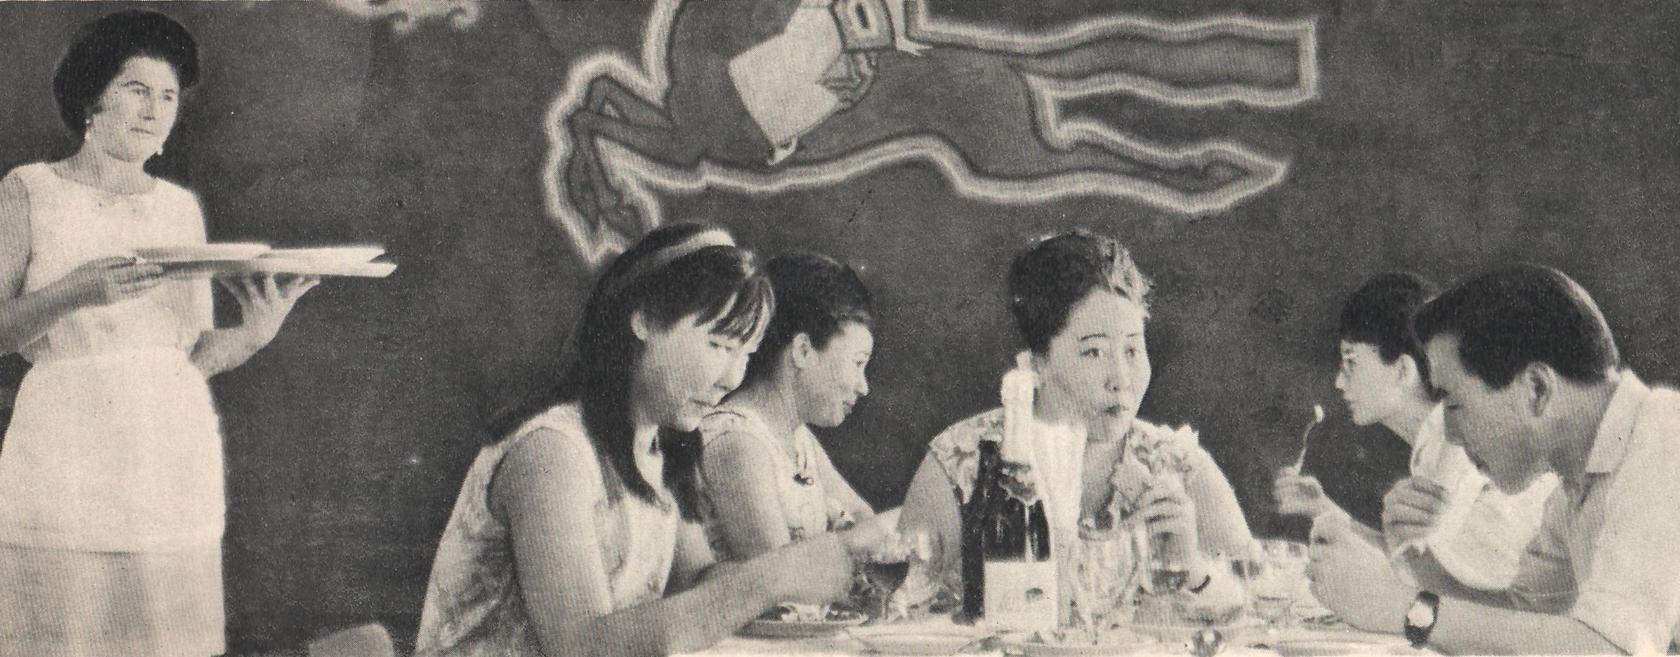 В ресторане. 1971 год